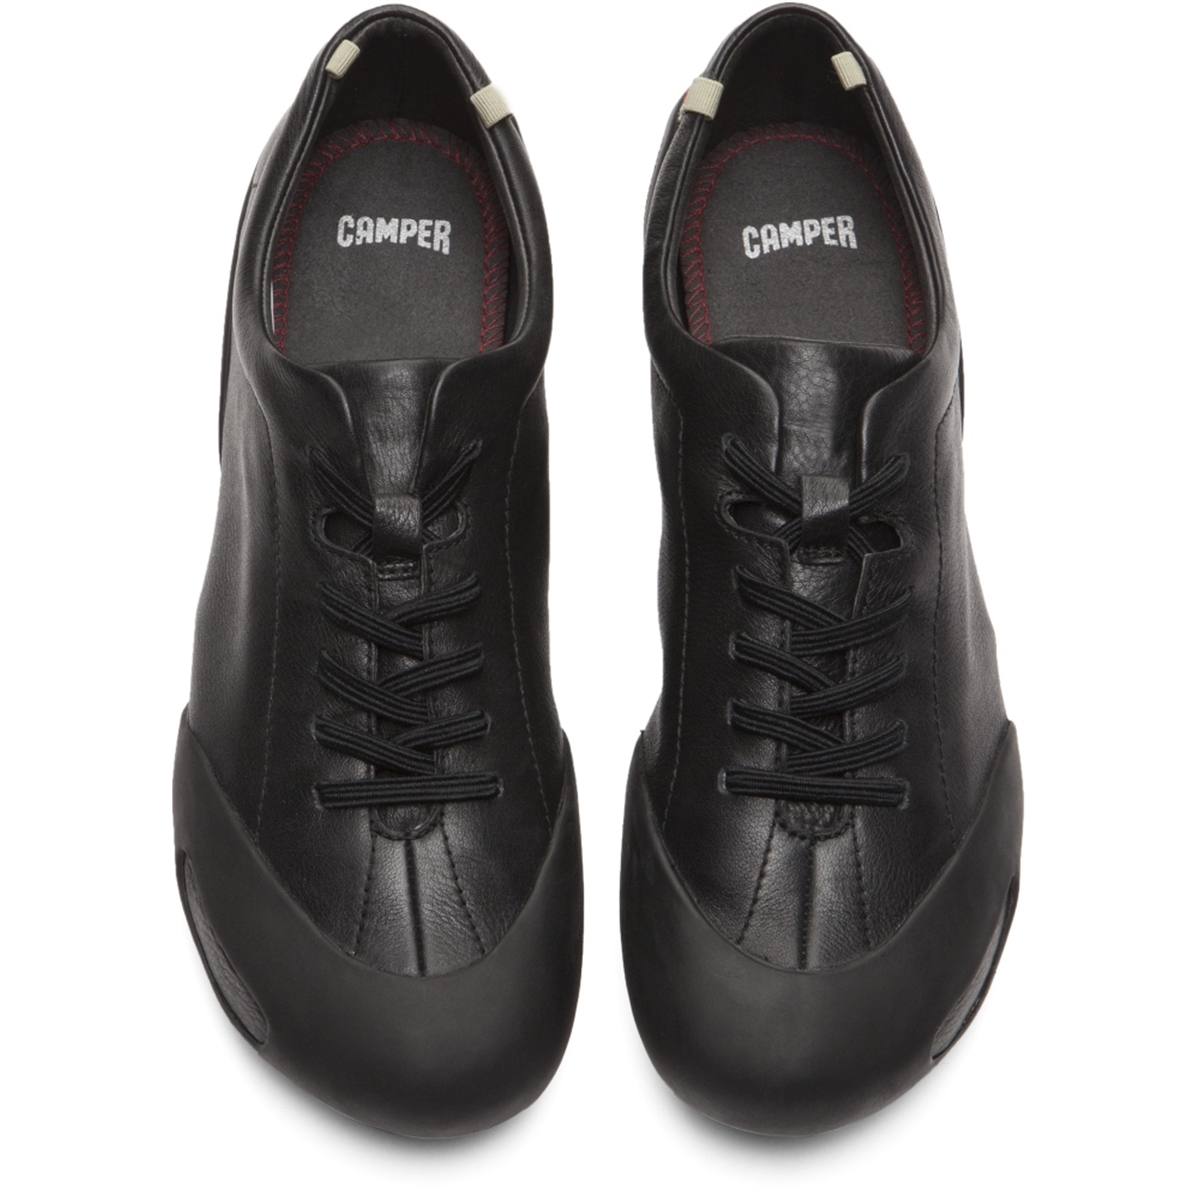 Camper Women Peu Senda Economical, stylish, and eye-catching shoes